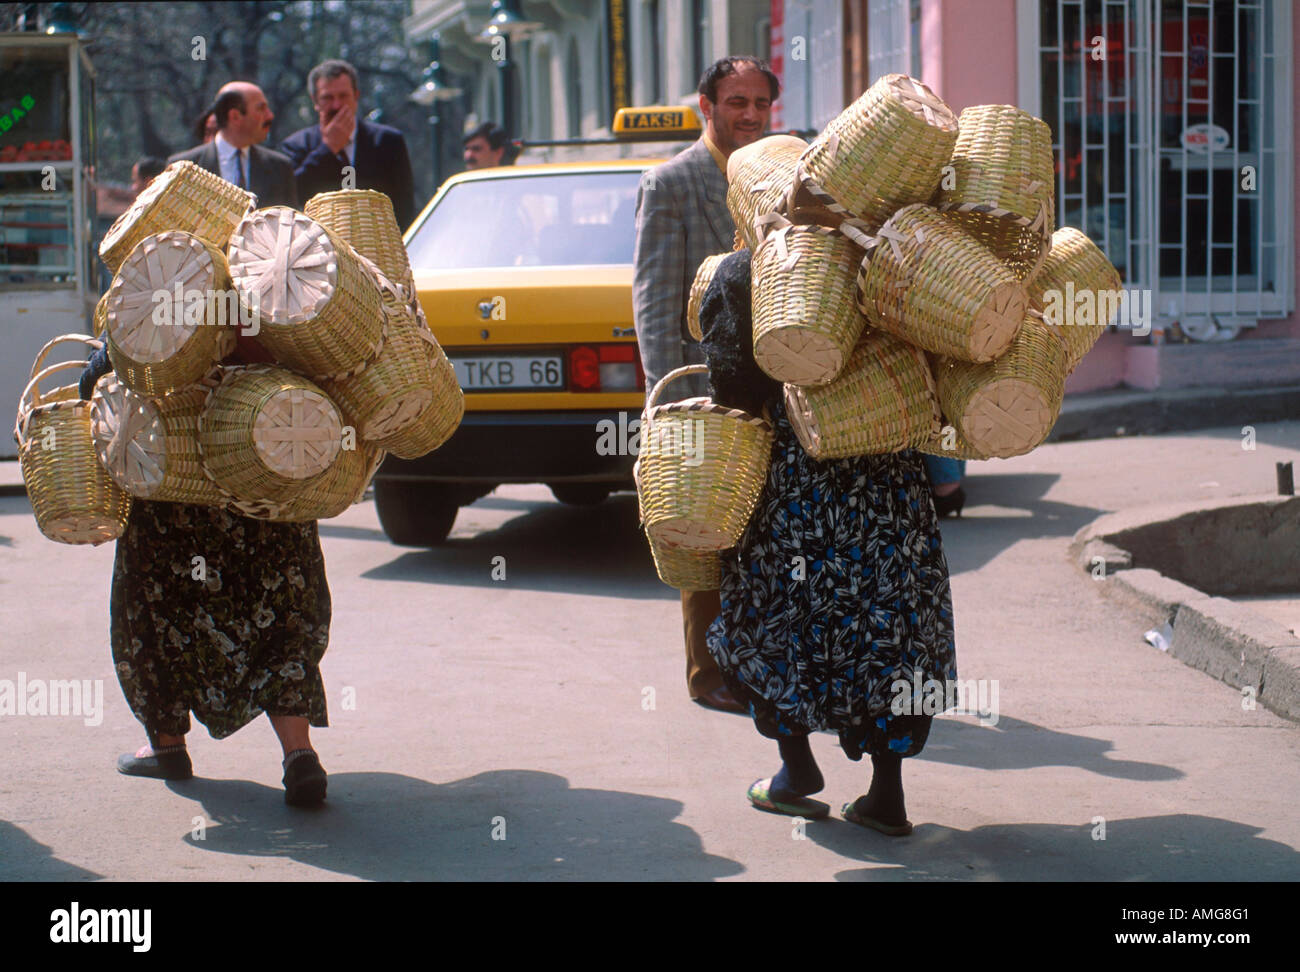 Ägypten, Istanbul, Frauen eigenen wie Stockbild